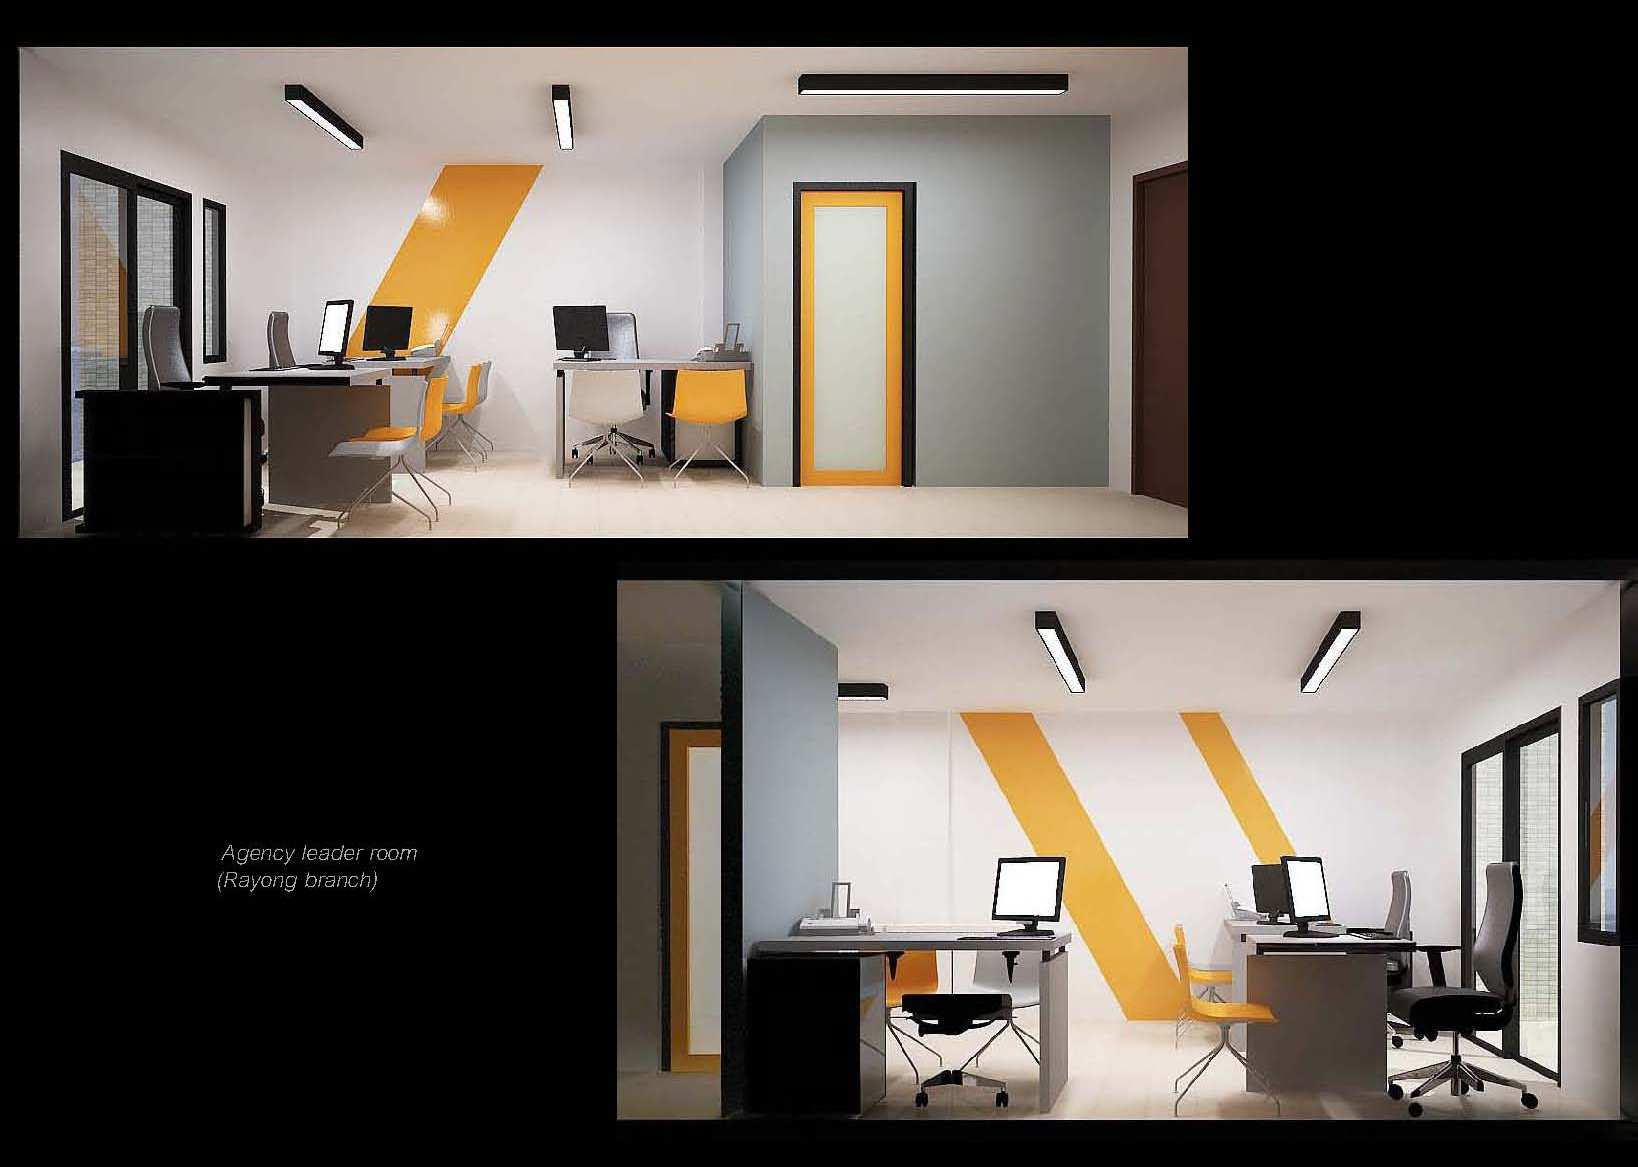 Agency leader room